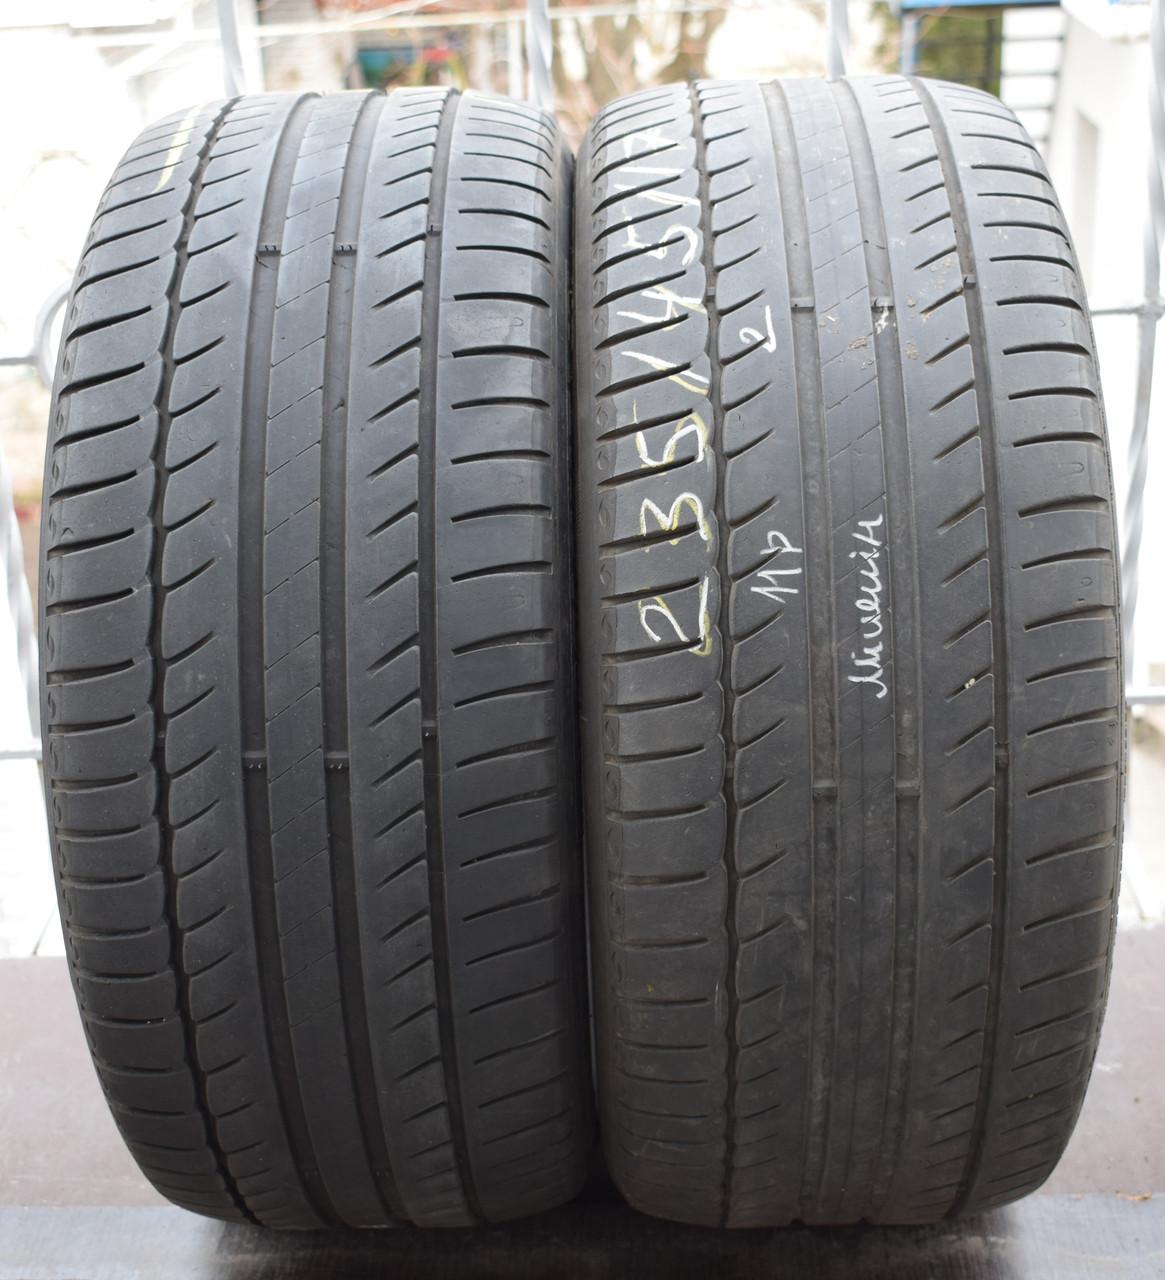 Летние шины б/у 235/45 R17 Michelin Primacy, пара